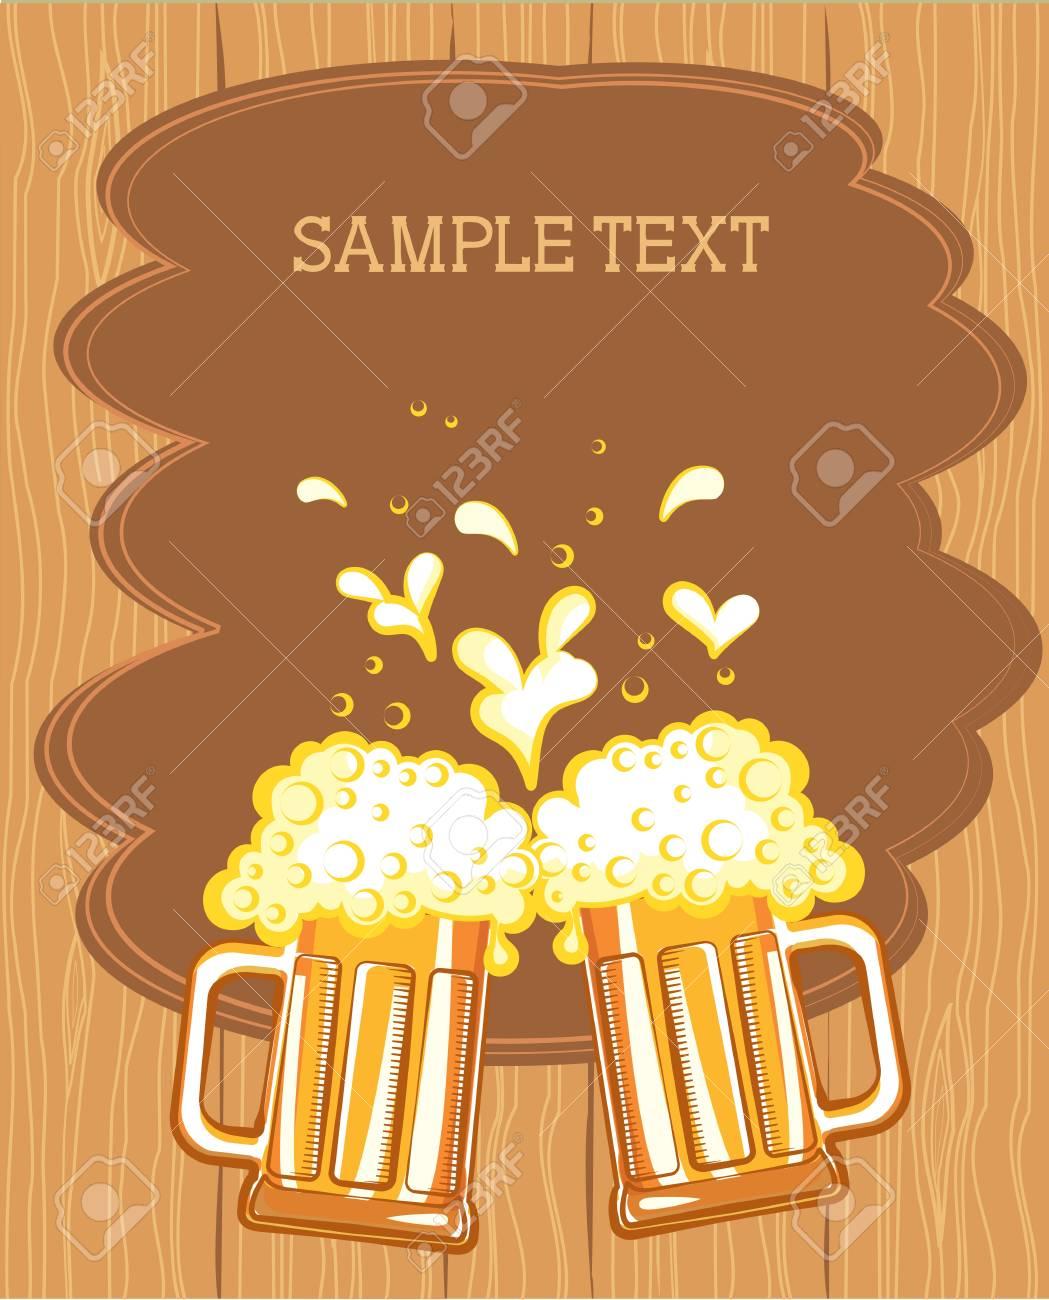 Glasses of beer. color symbol of Illustration for design Stock Vector - 9533136